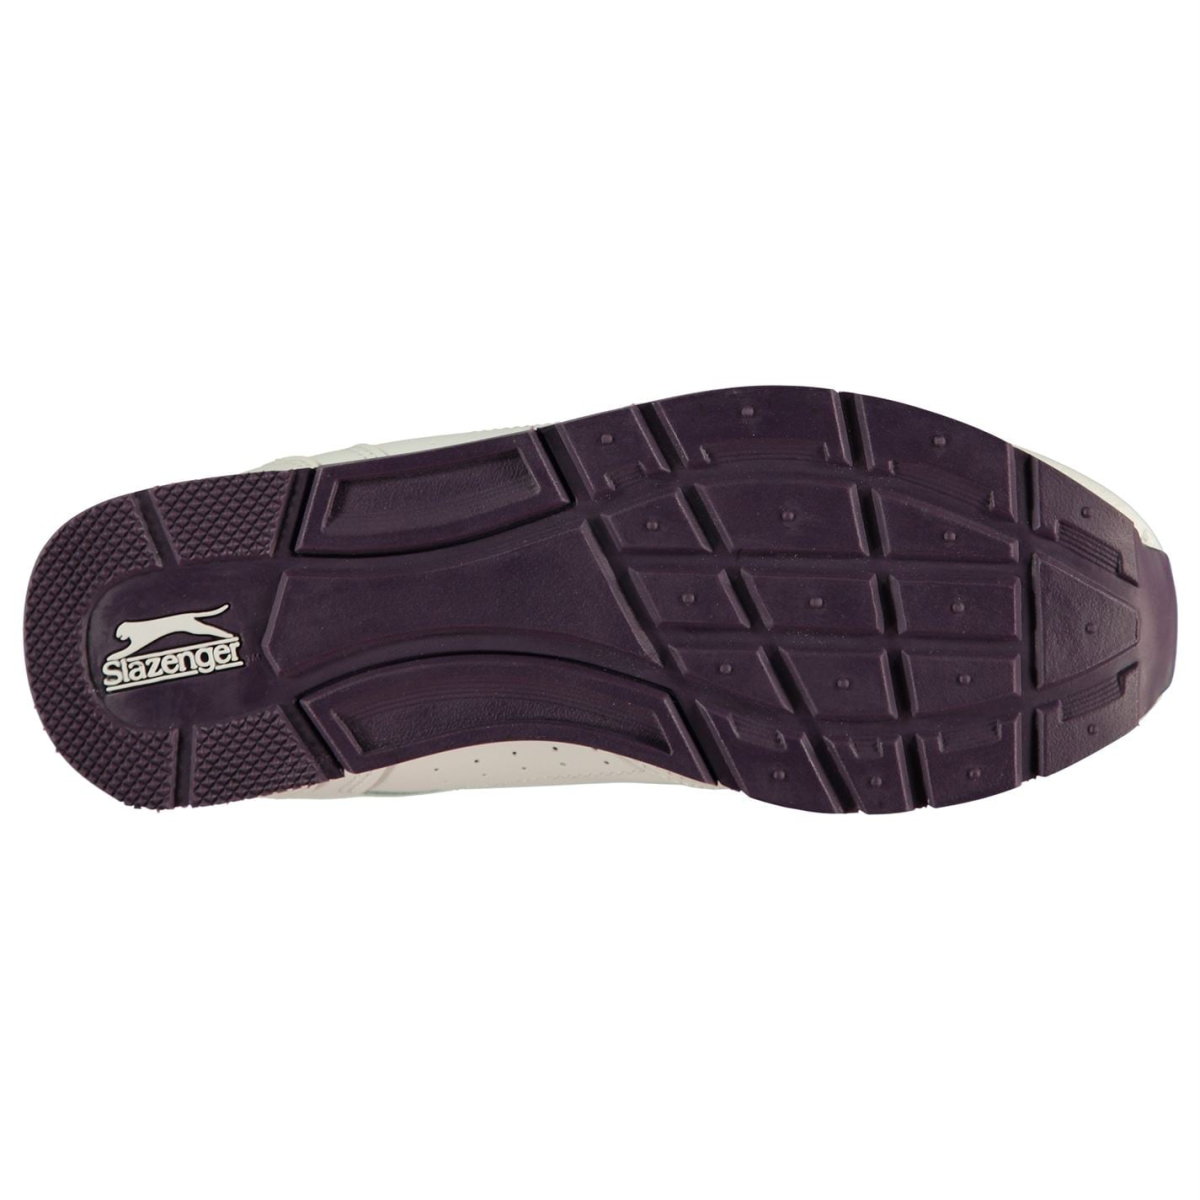 Slazenger-Classic-Turnschuhe-Laufschuhe-Damen-Sportschuhe-Sneaker-1265 Indexbild 21